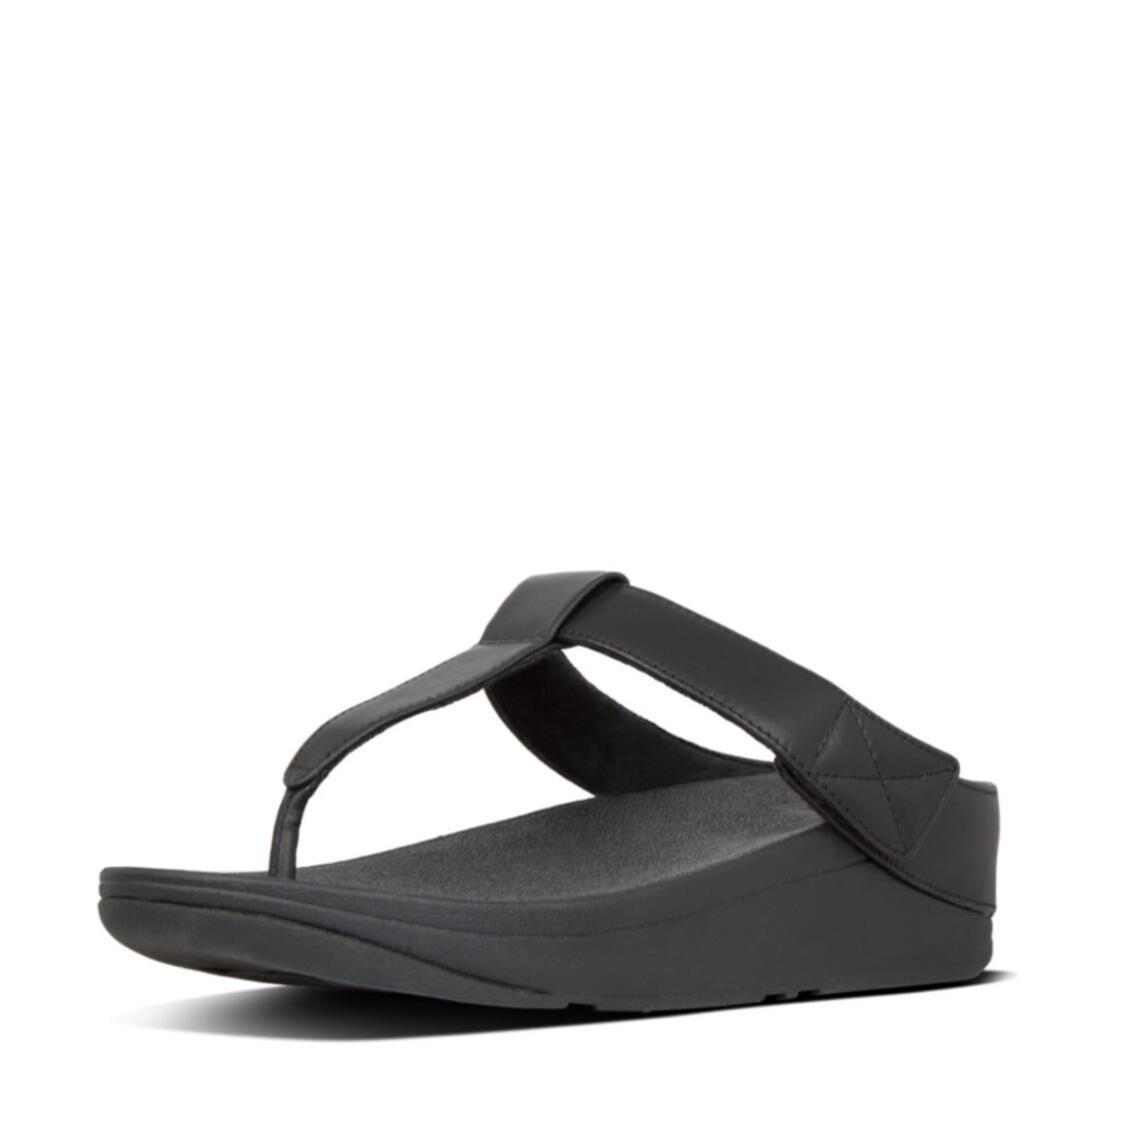 Fitflop Mina Toe Thongs Black